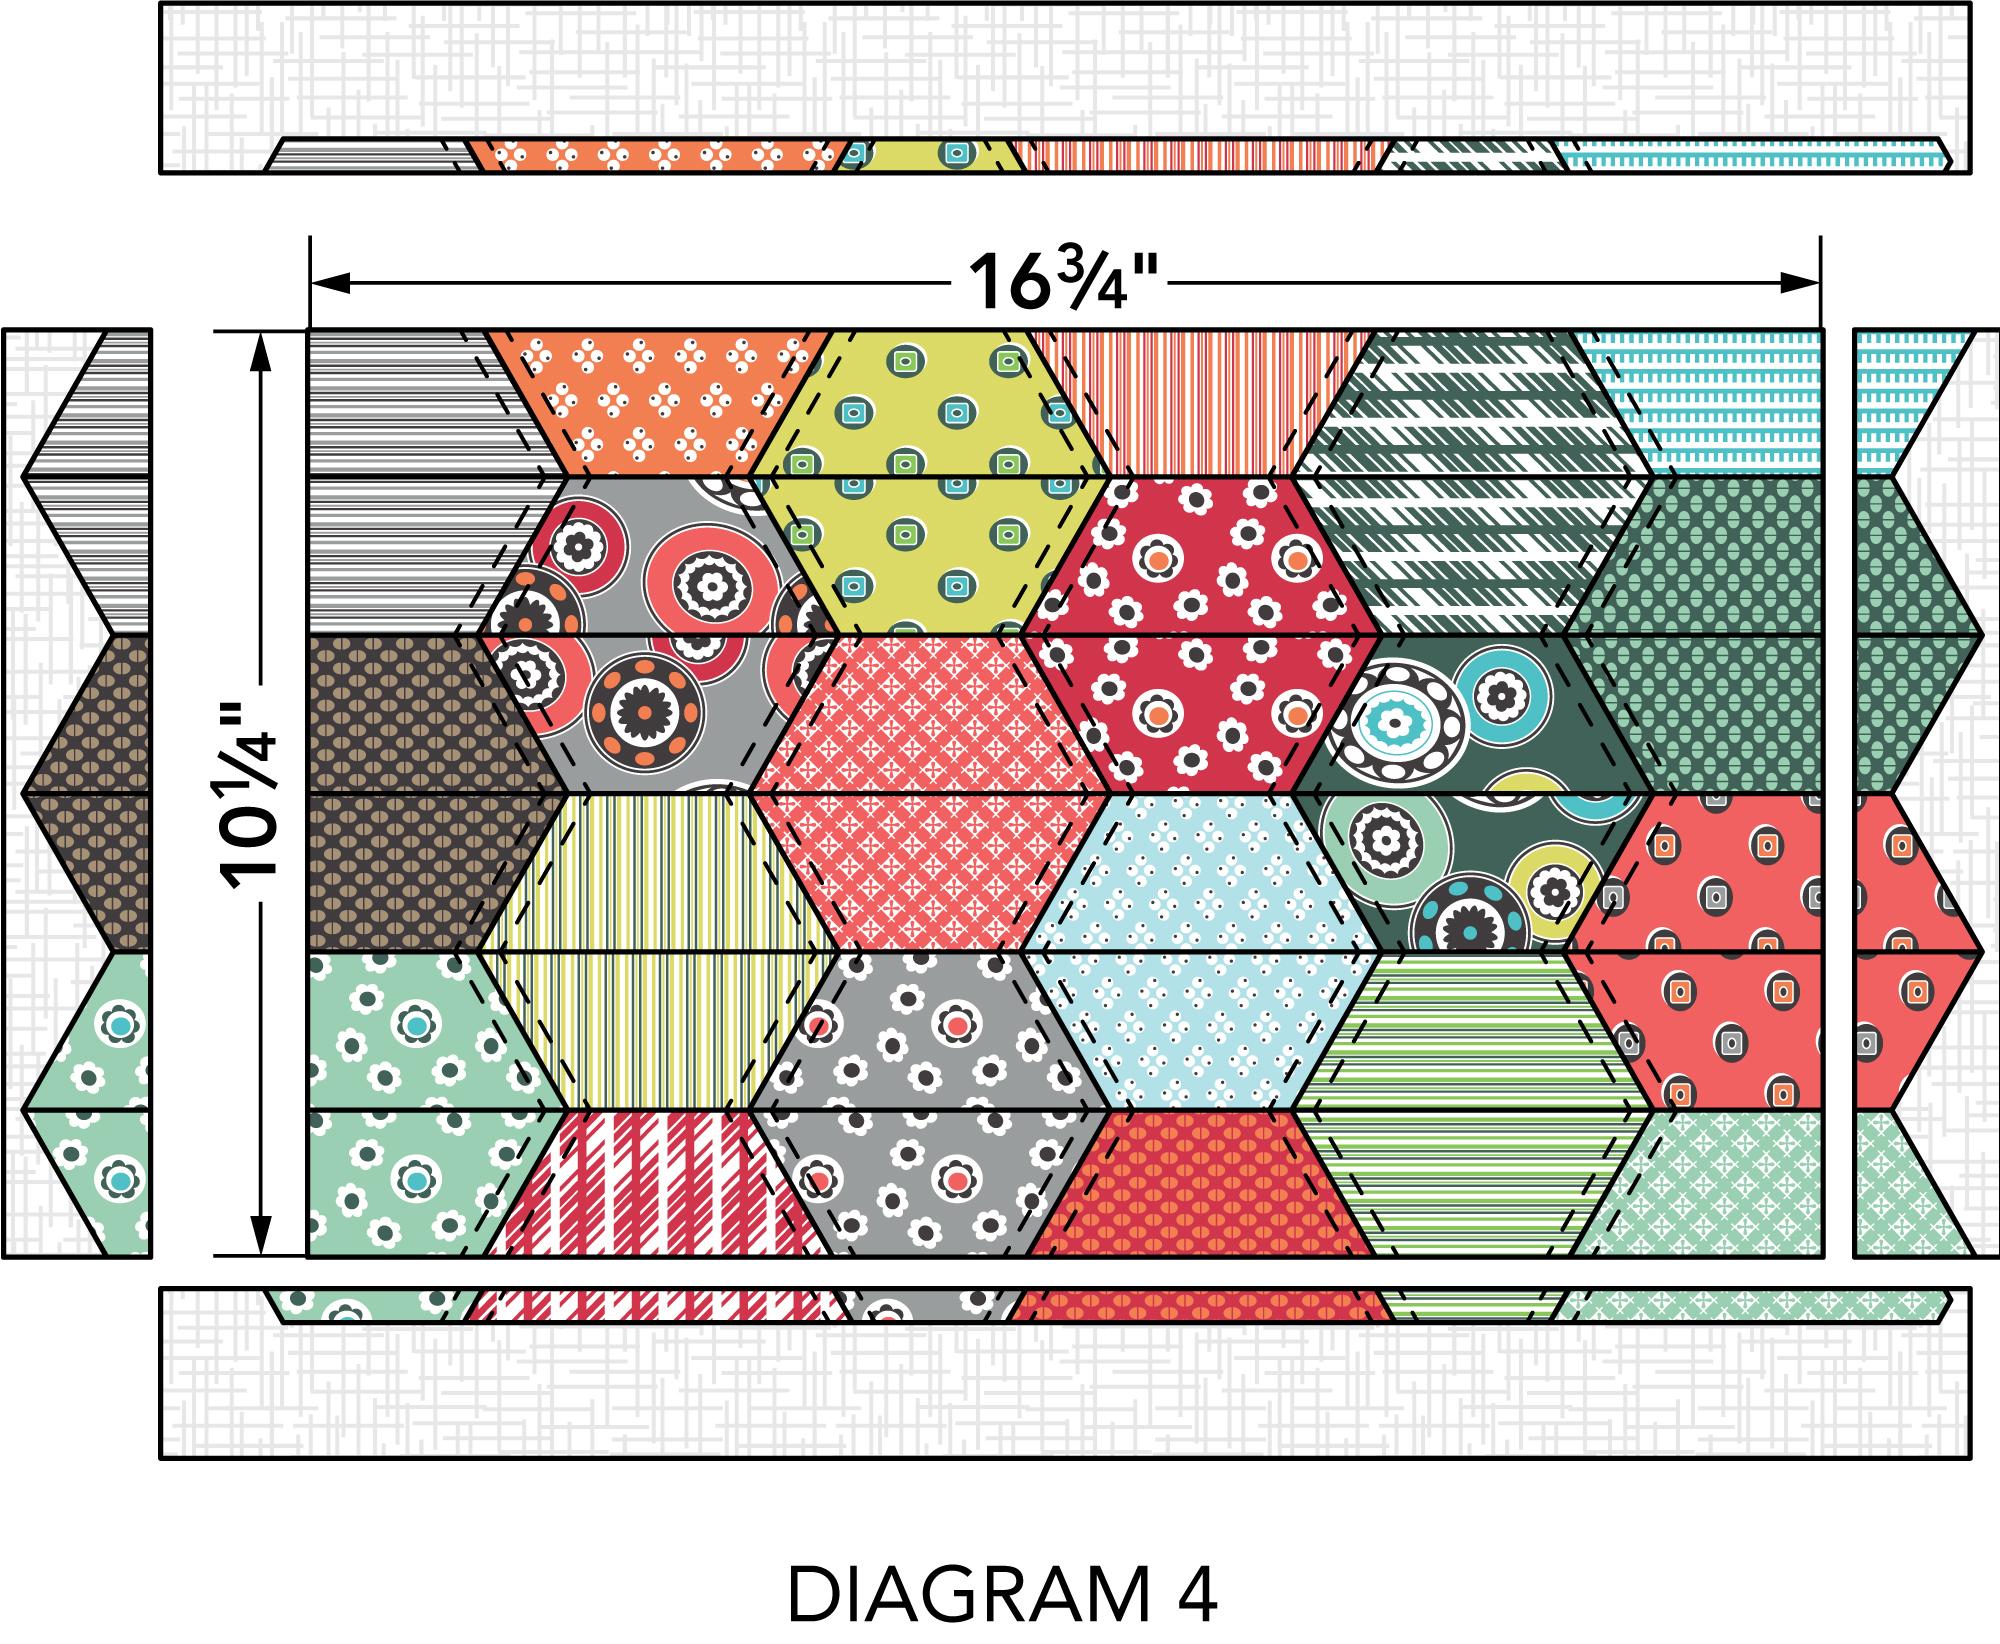 Sew Write journal diagram 4